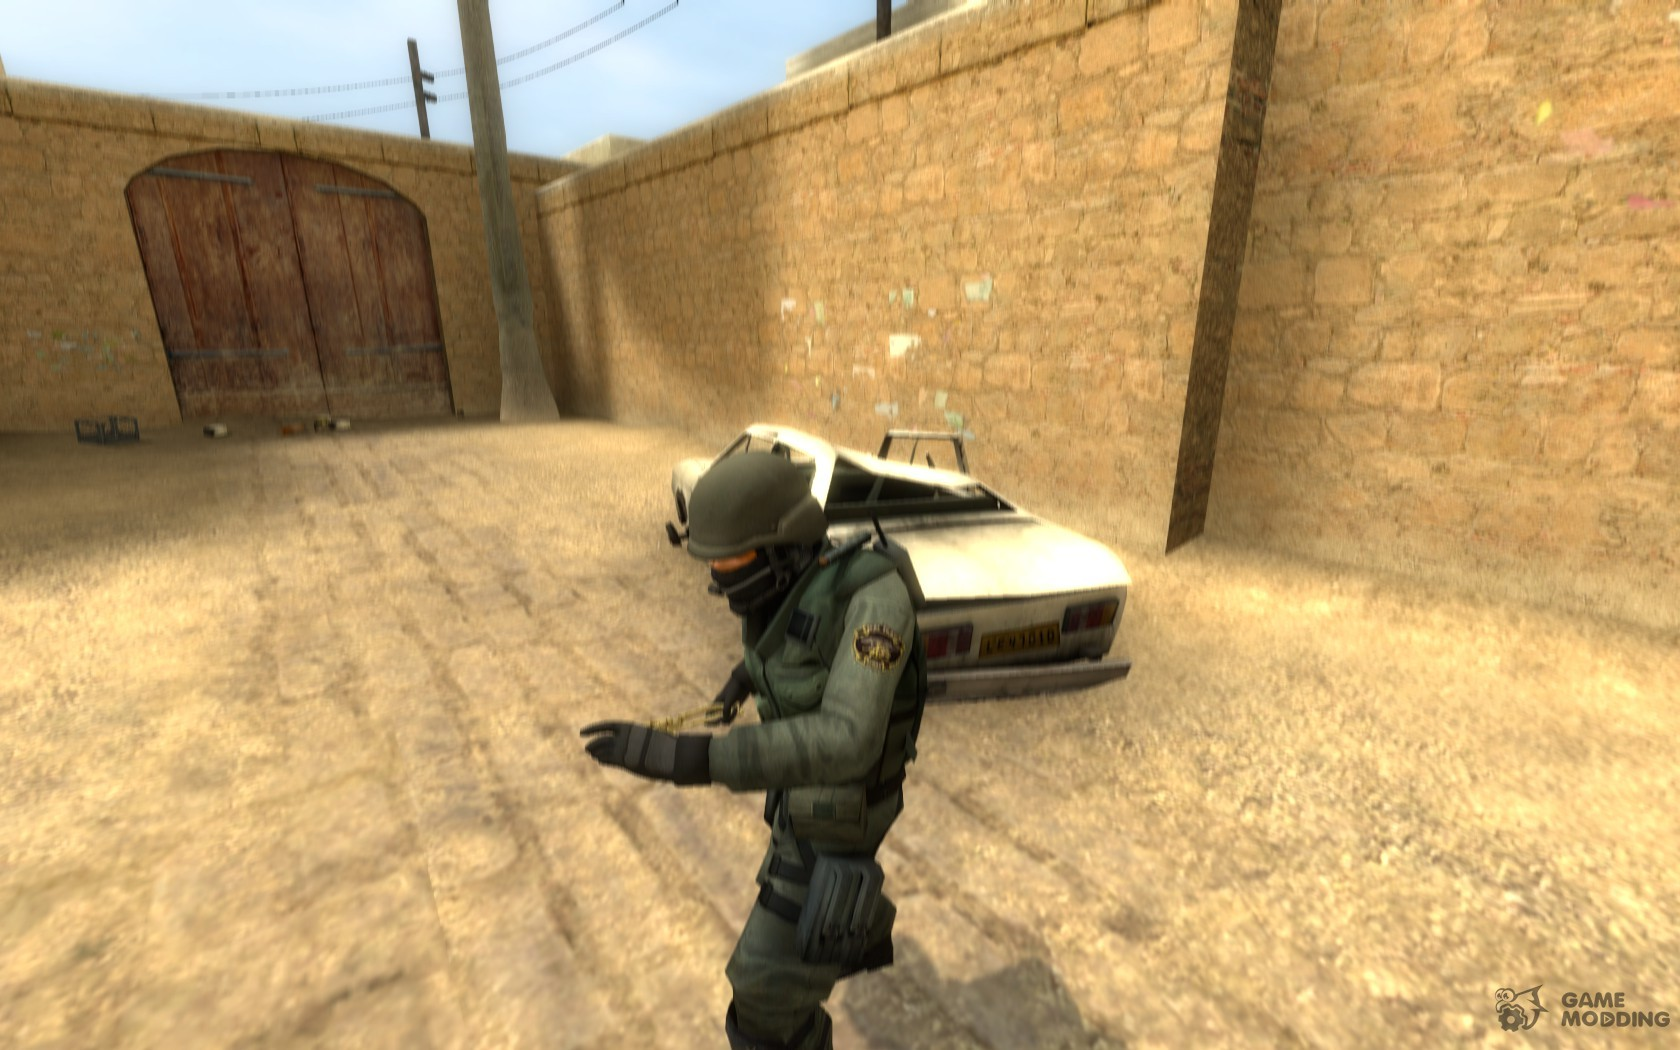 Skeleton arm knife for Counter-Strike Source